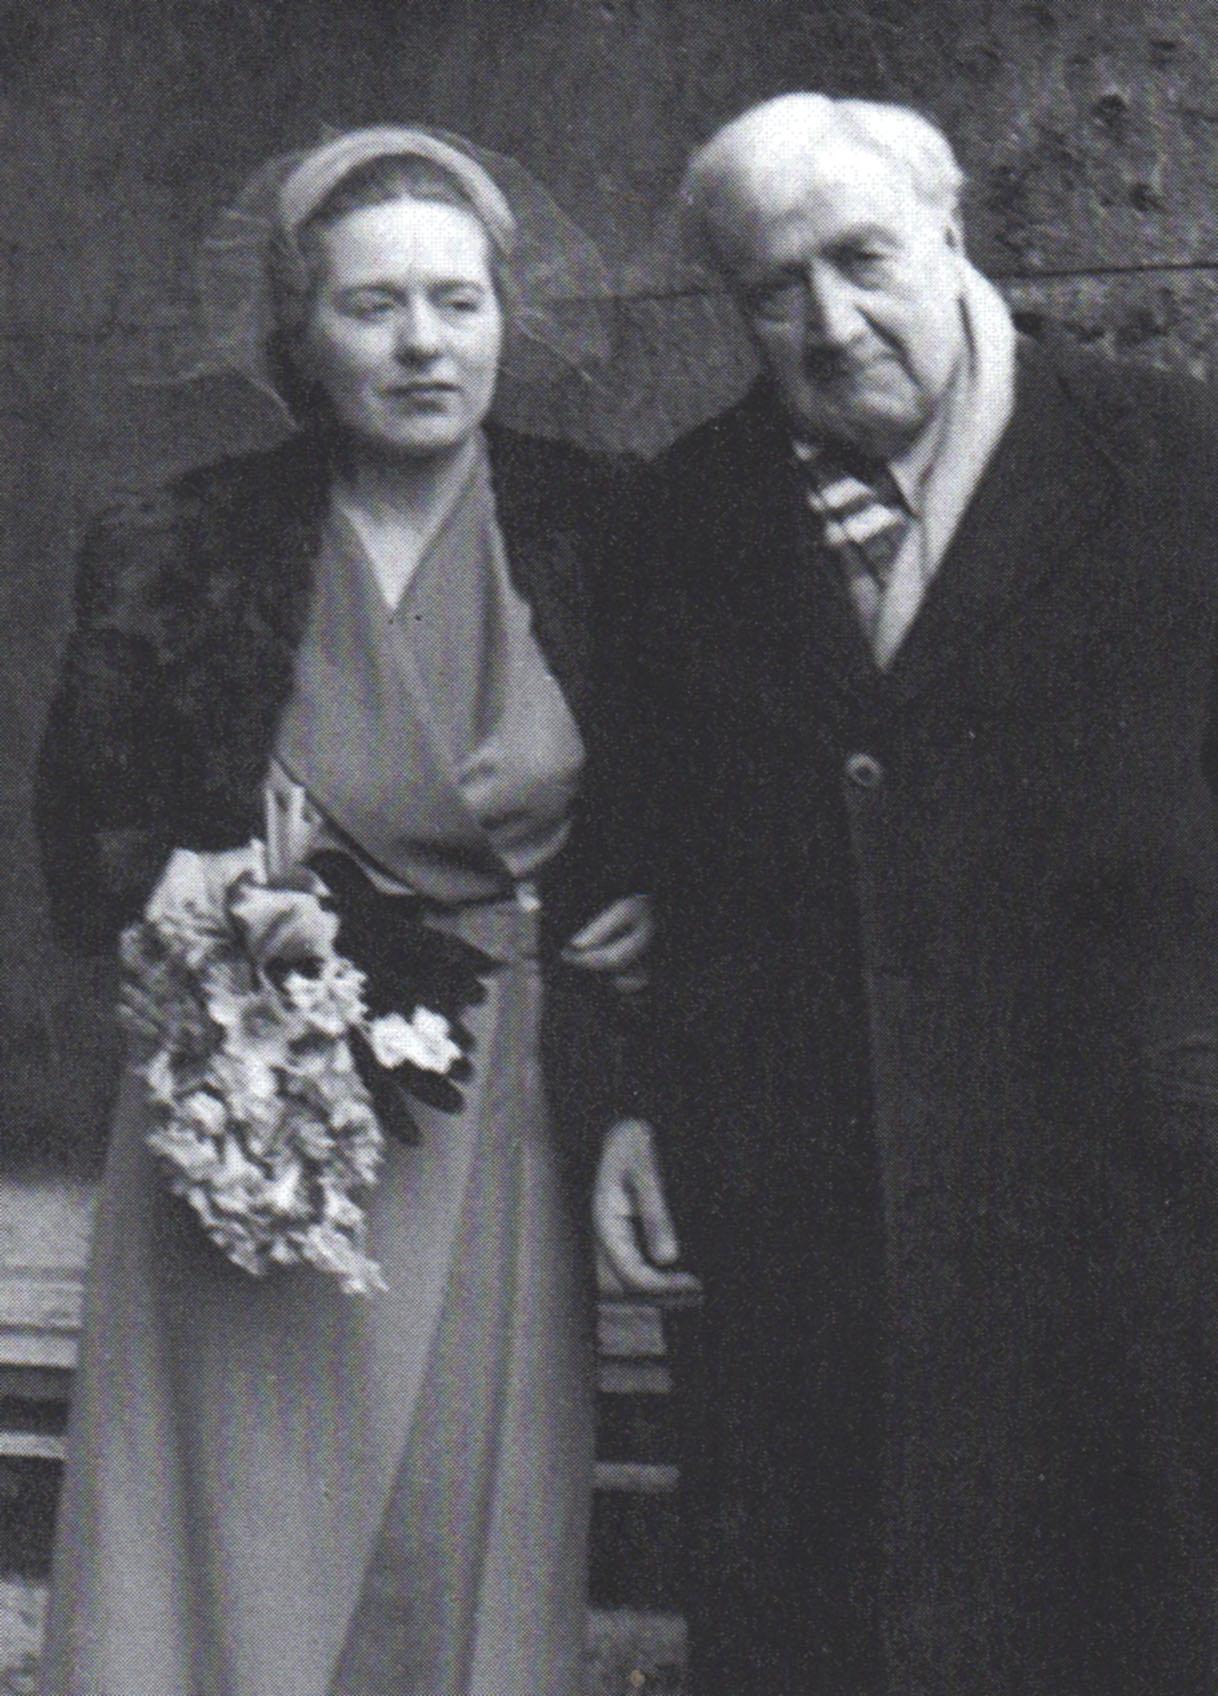 Vaughan Williams marries Ursula Wood